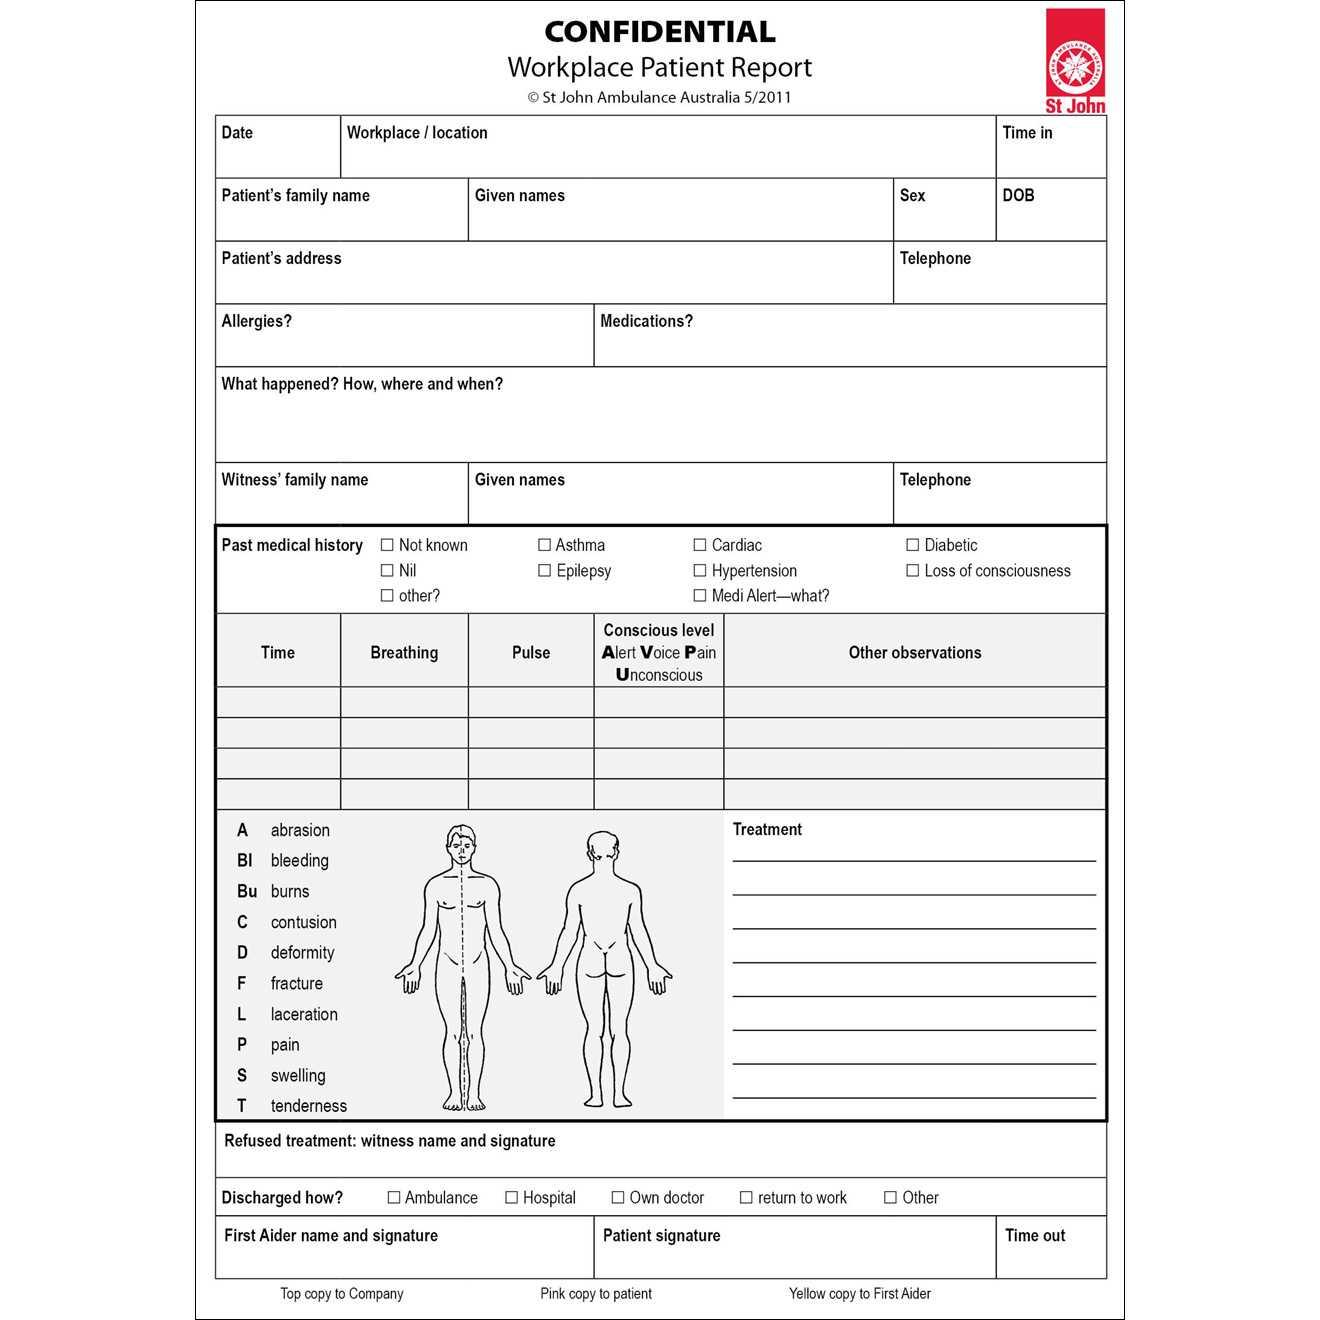 First Aid Incident Report Template - Karan.ald2014 Throughout Incident Report Form Template Qld